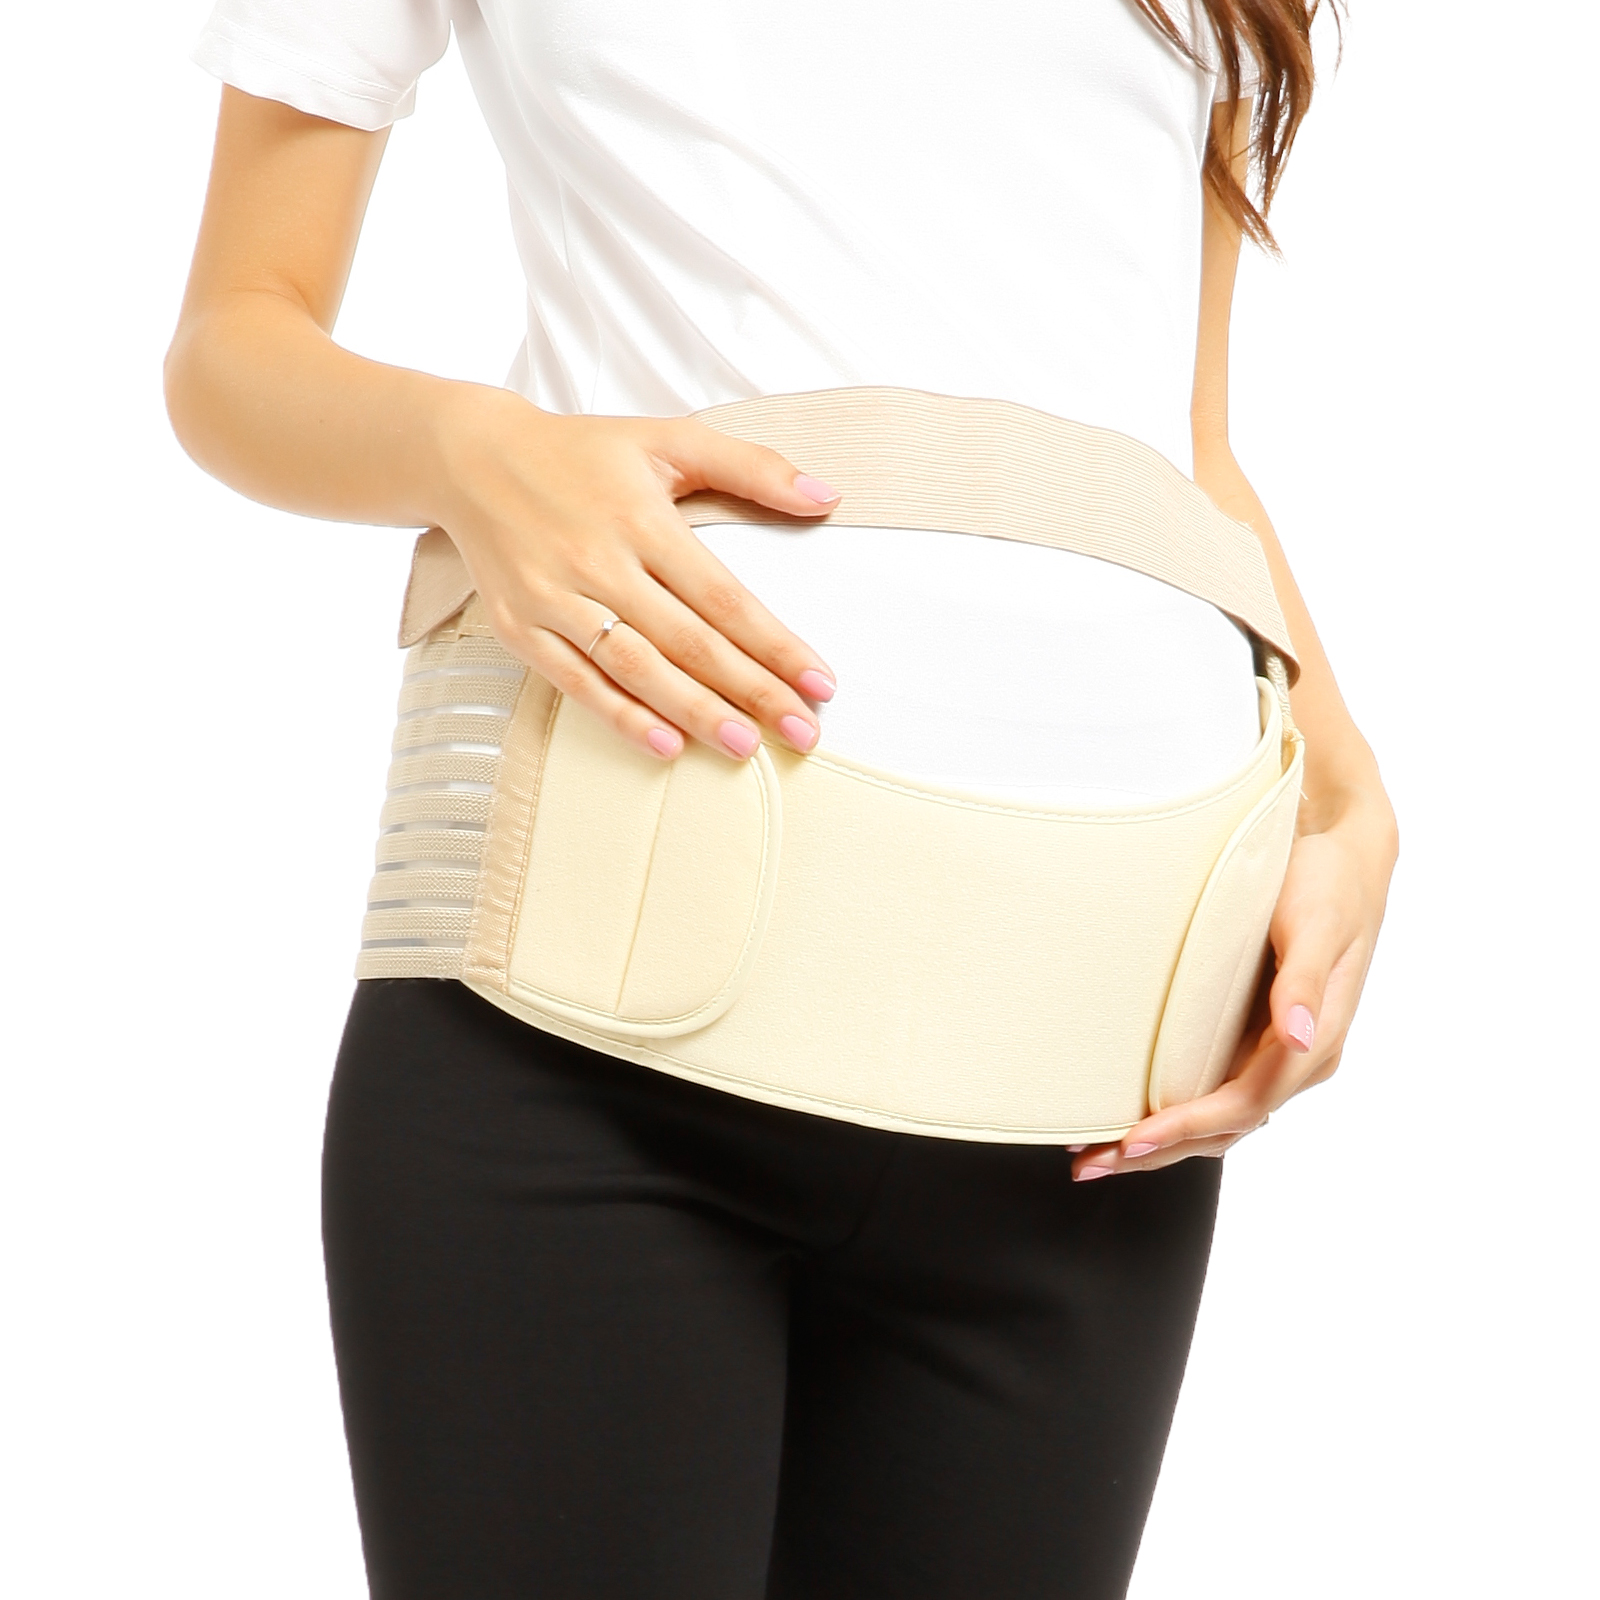 Maternity Pregnancy Support Belt Prenatal Belly Band Waist ...